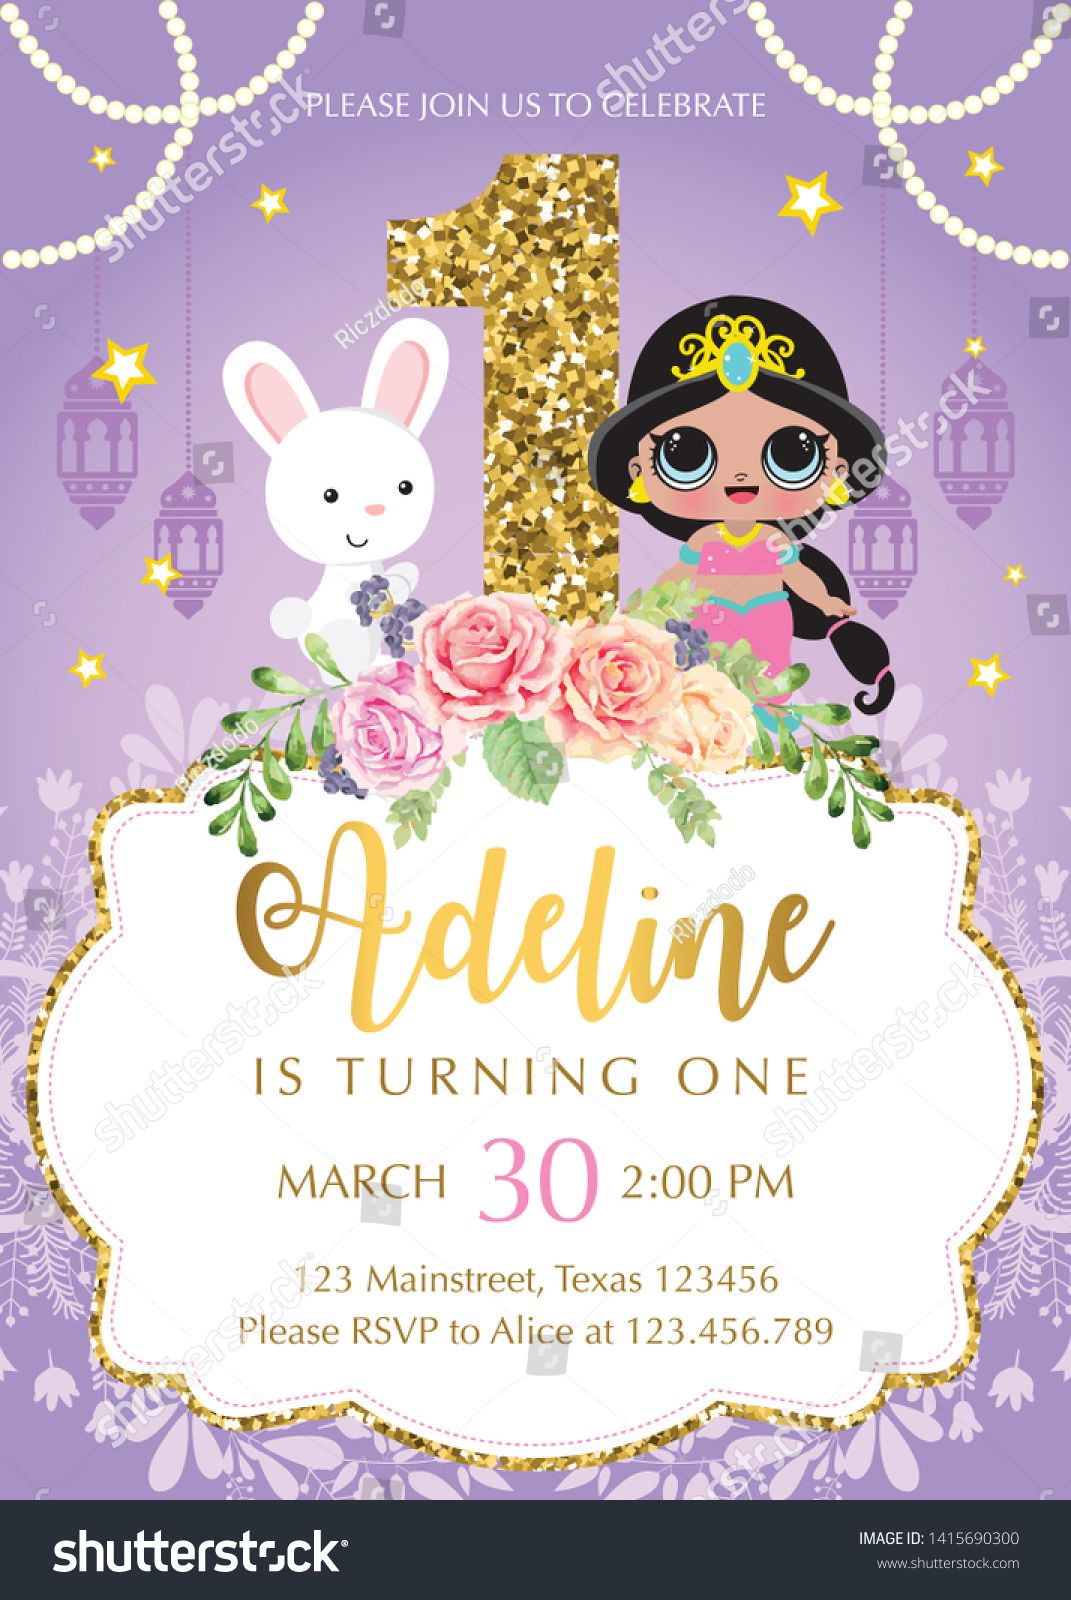 Invitation Card Template Princess Jasmine Lol Lolparty